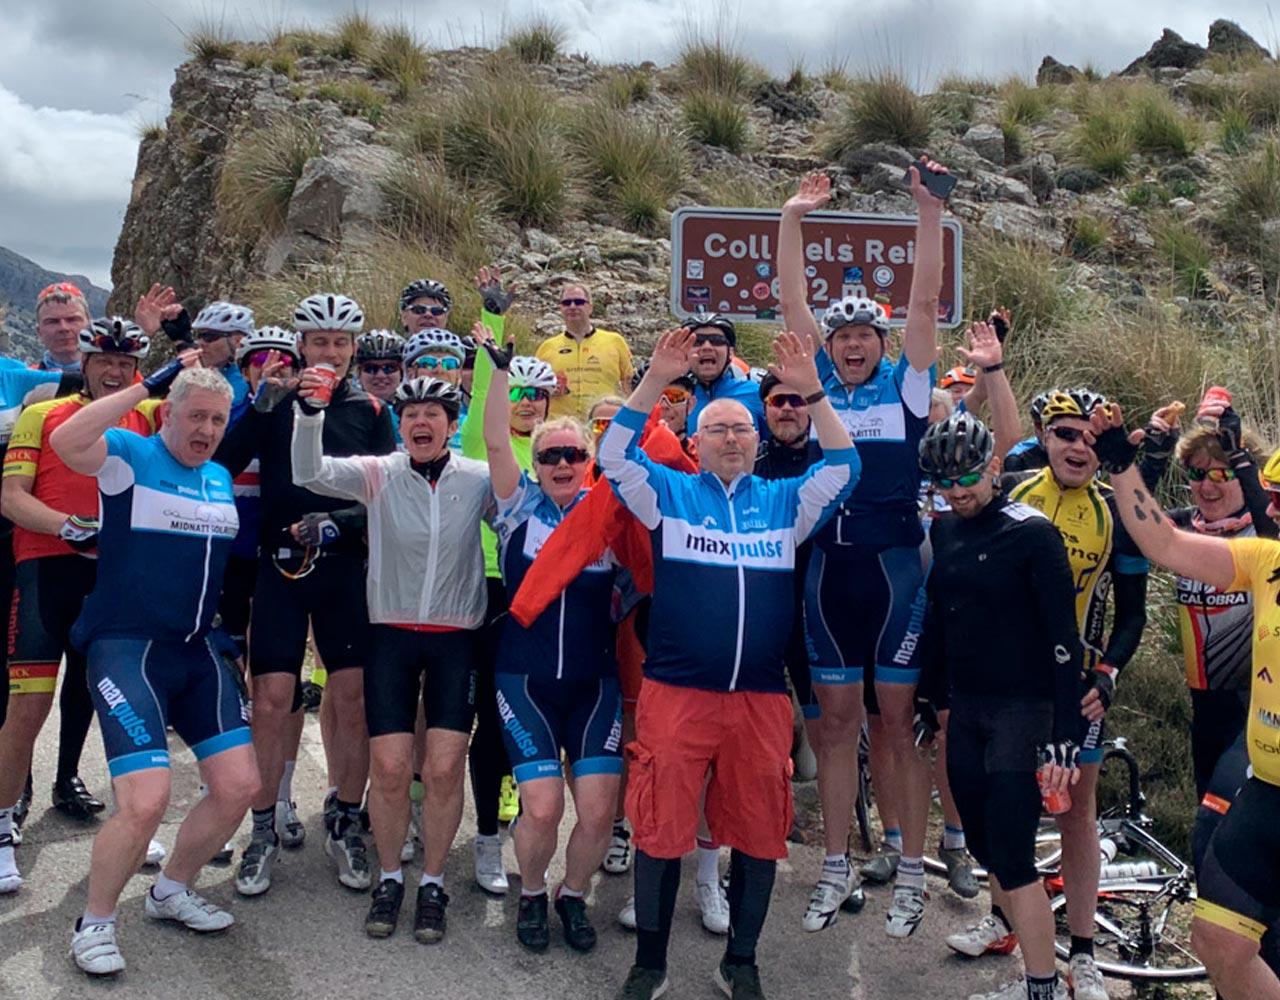 Sykkeltur på Mallorca, reise, sykkeltur, maxpulse, ferie